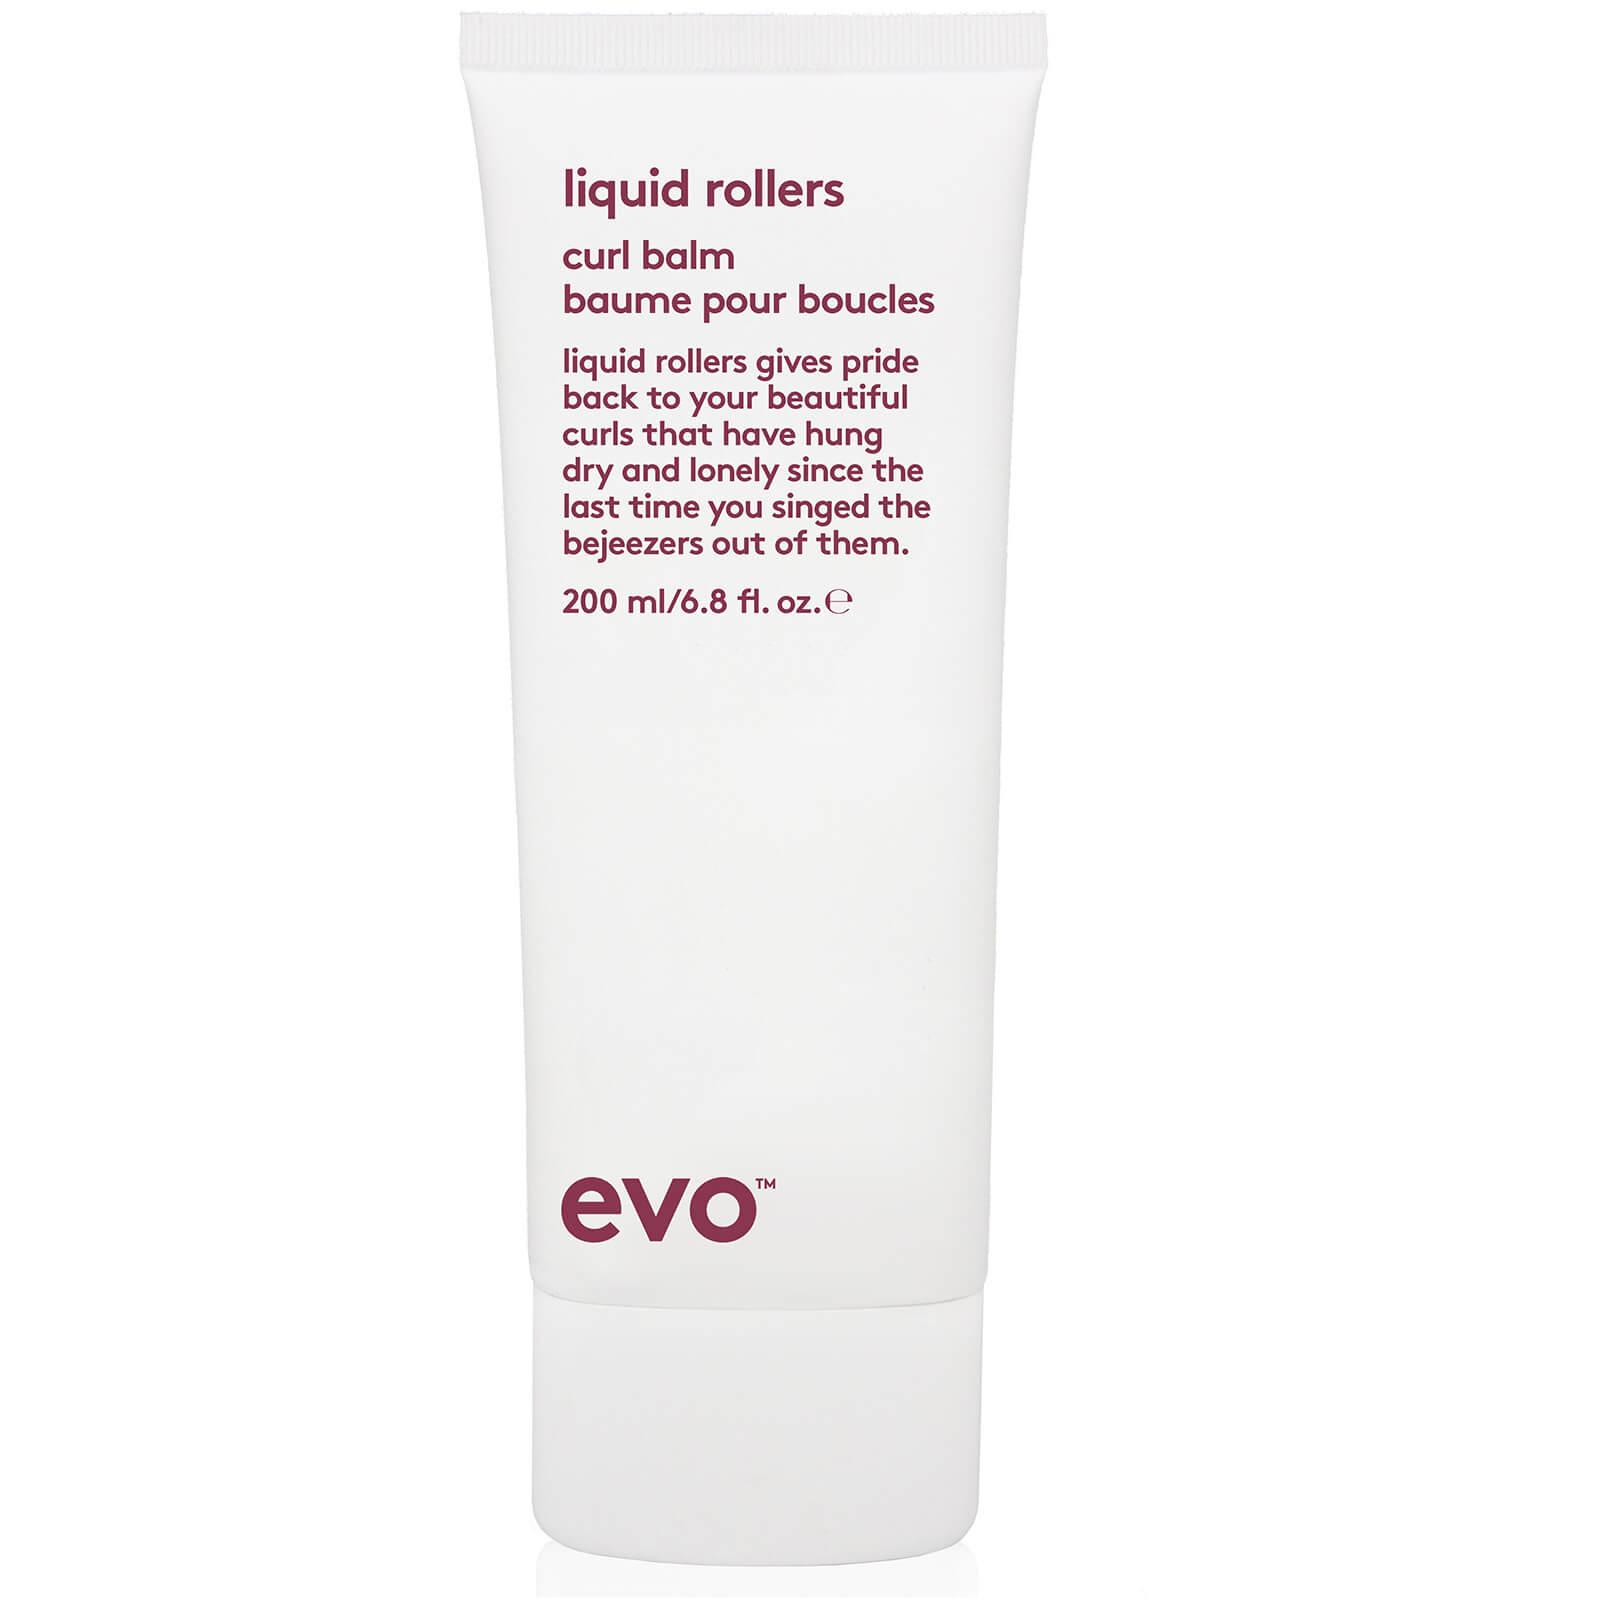 Evo Liquid Rollers Curl Balm 200ml Beautyexpert Sleep Buddy Set Bed Cover Square Cotton Sateen Extra